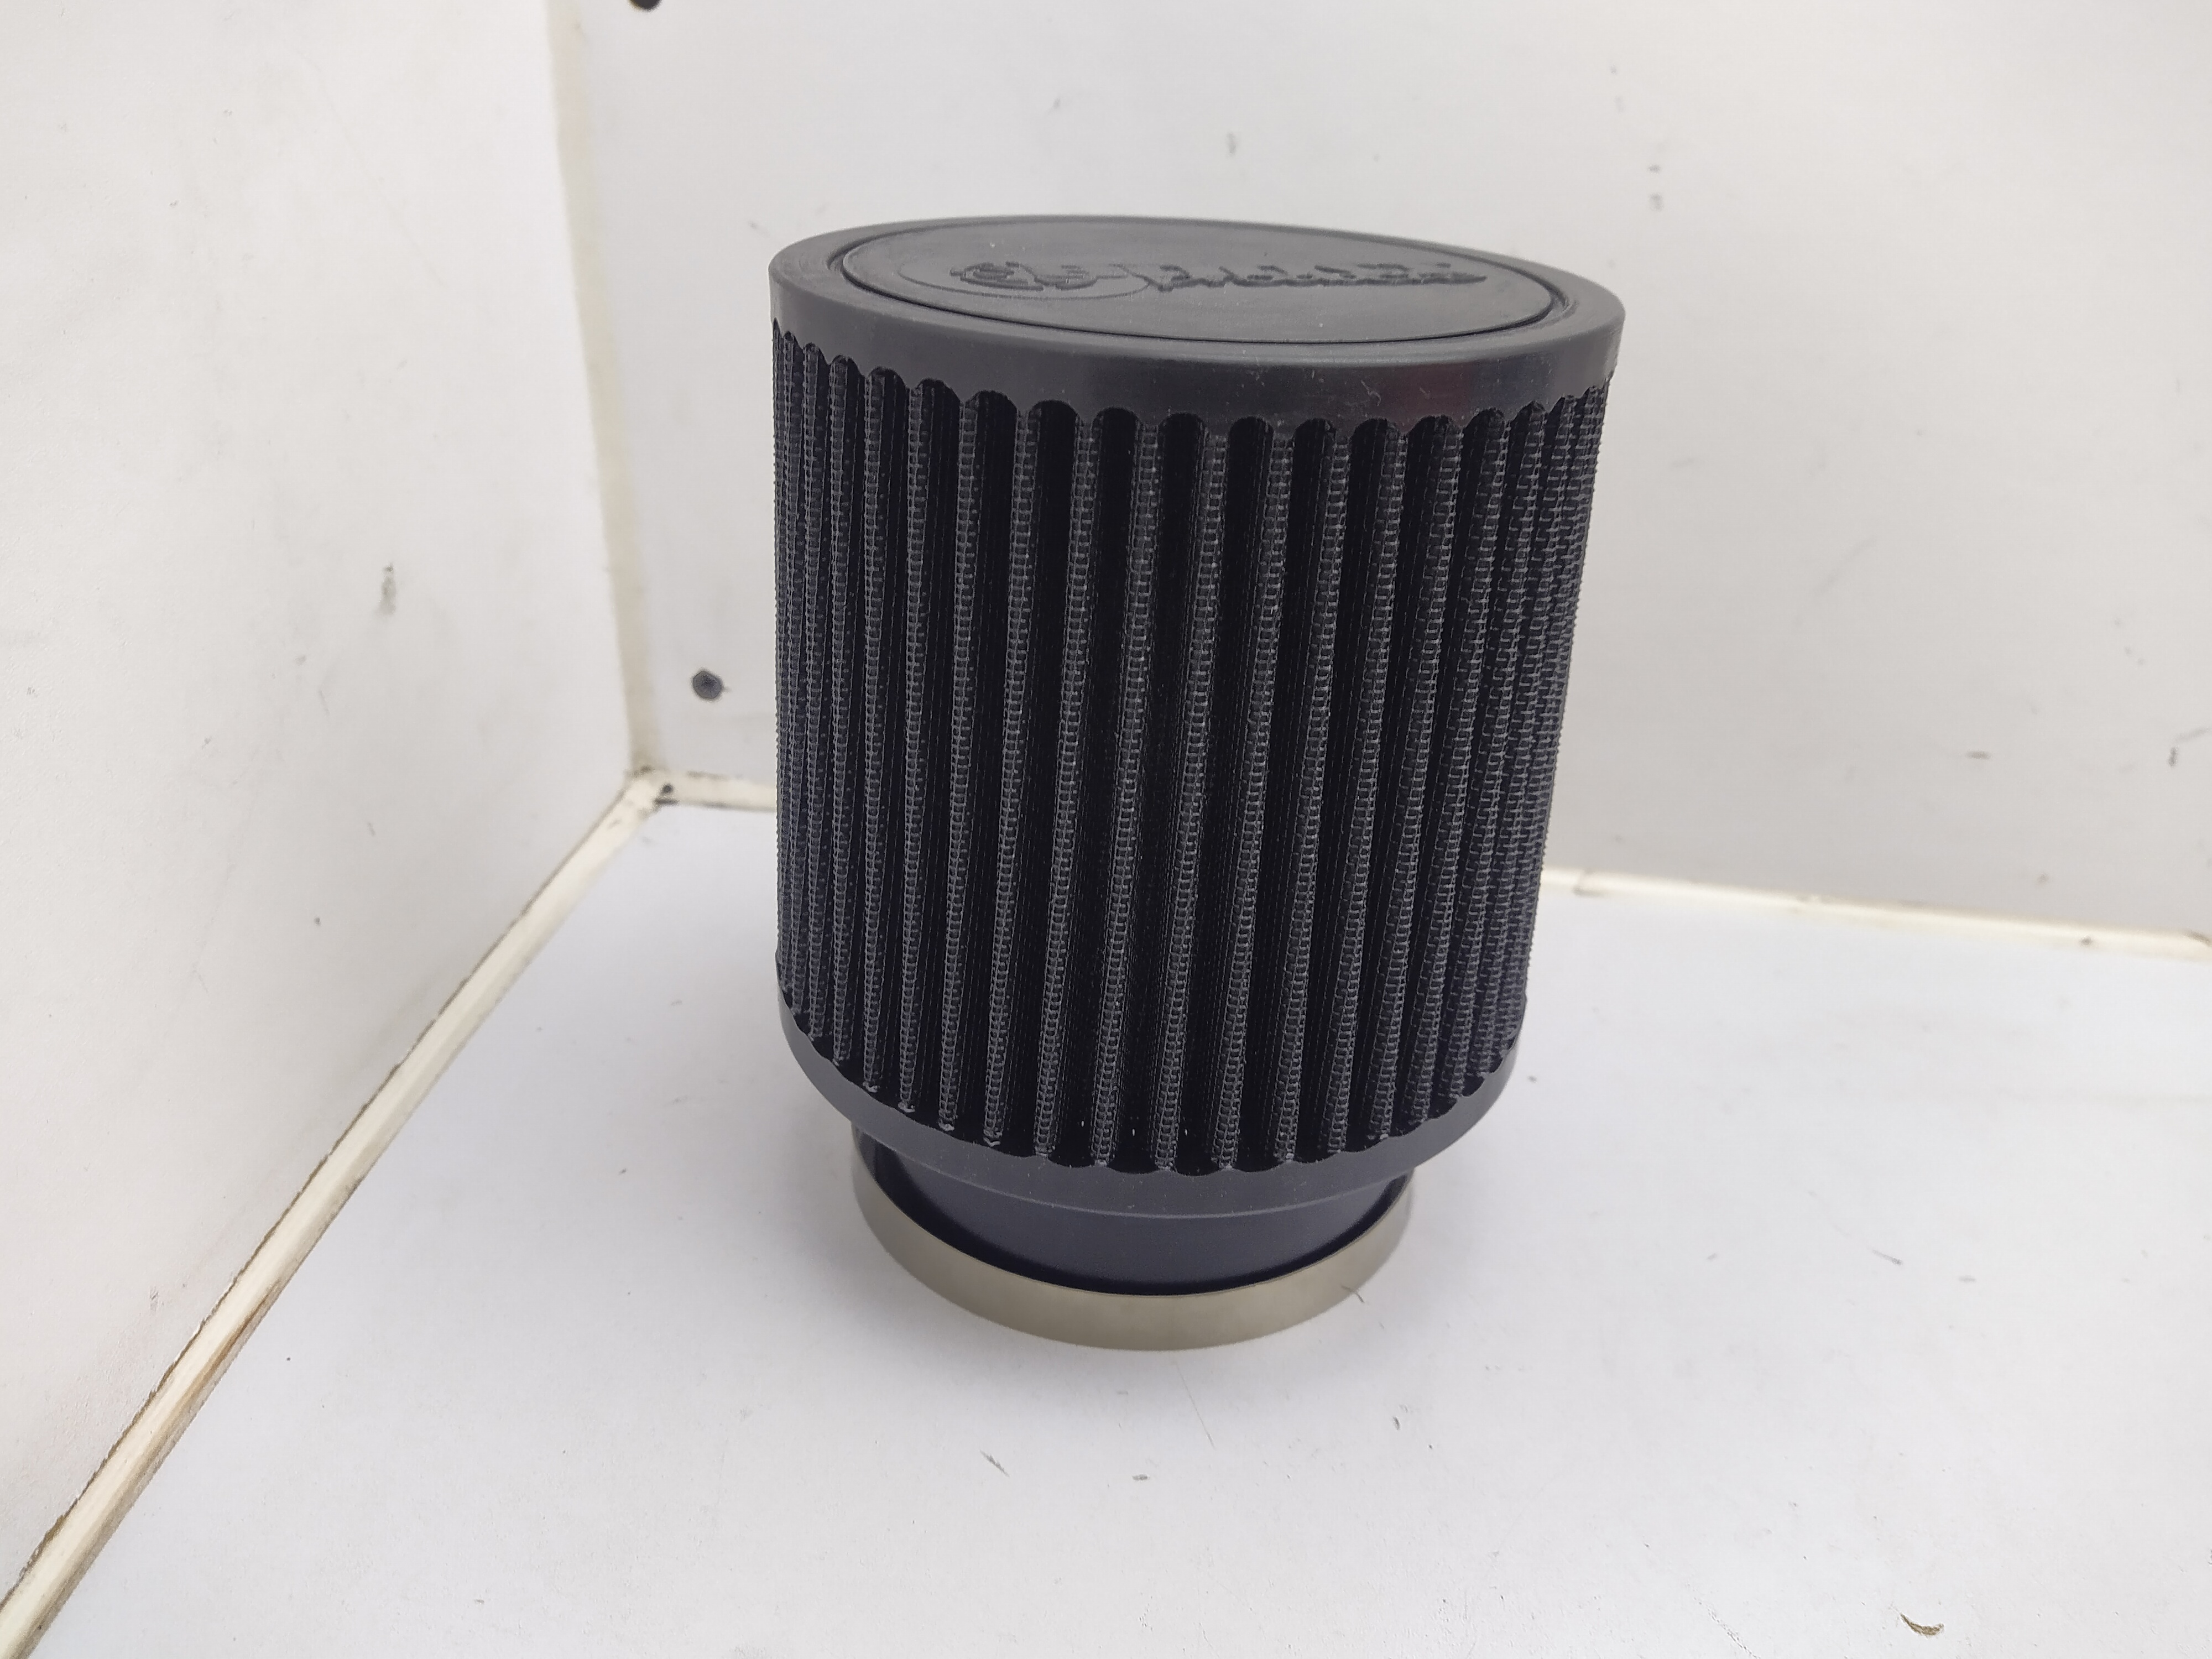 Universal Luftfilter schwarz 127mm / 89mm Anschluss Sportluftfilter